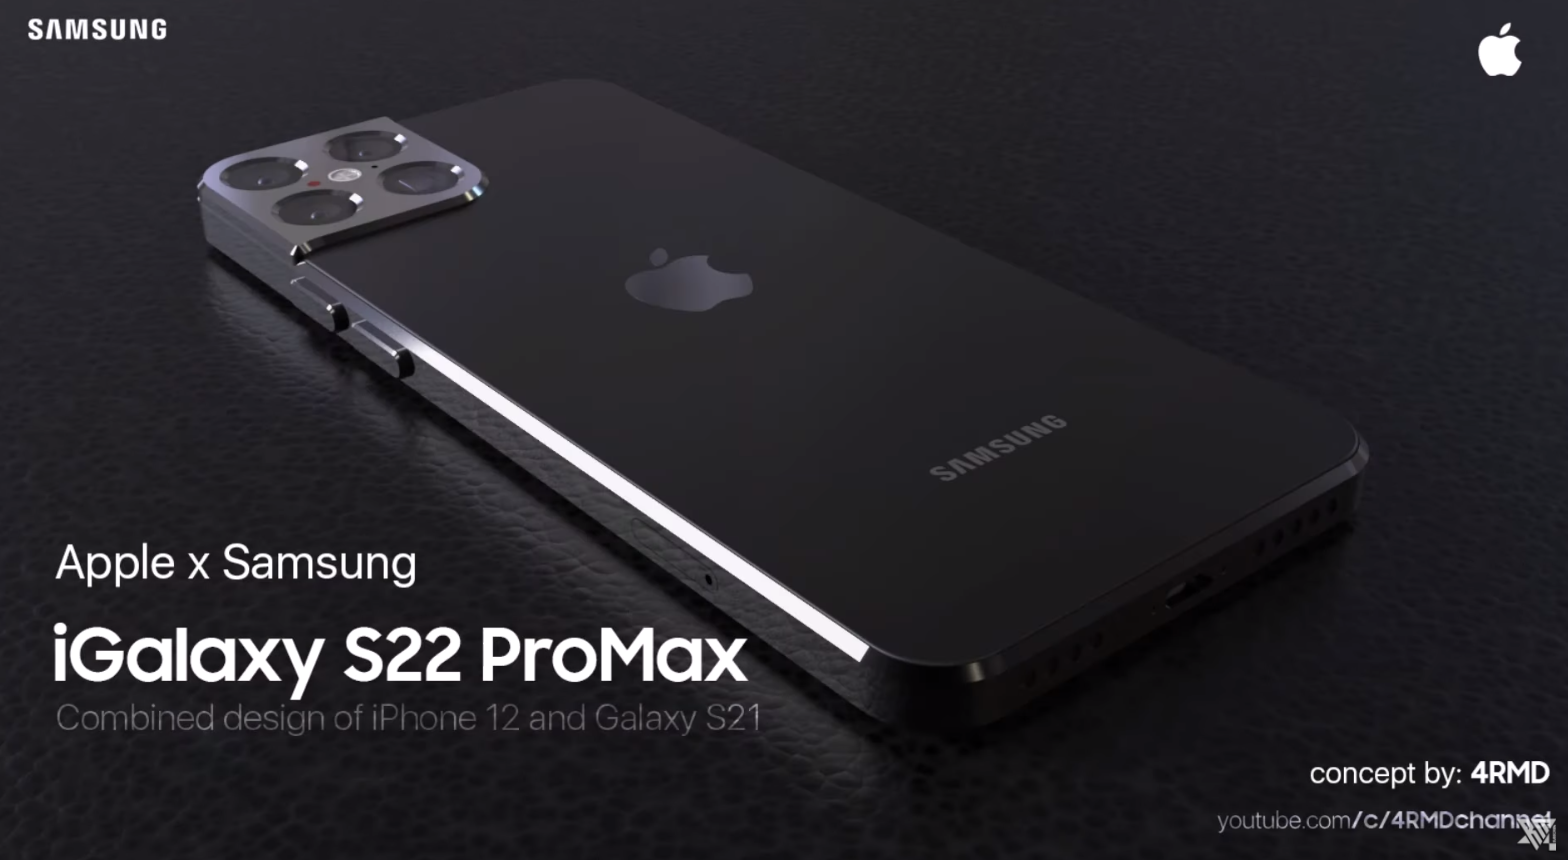 iGalaxy S22 ProMax